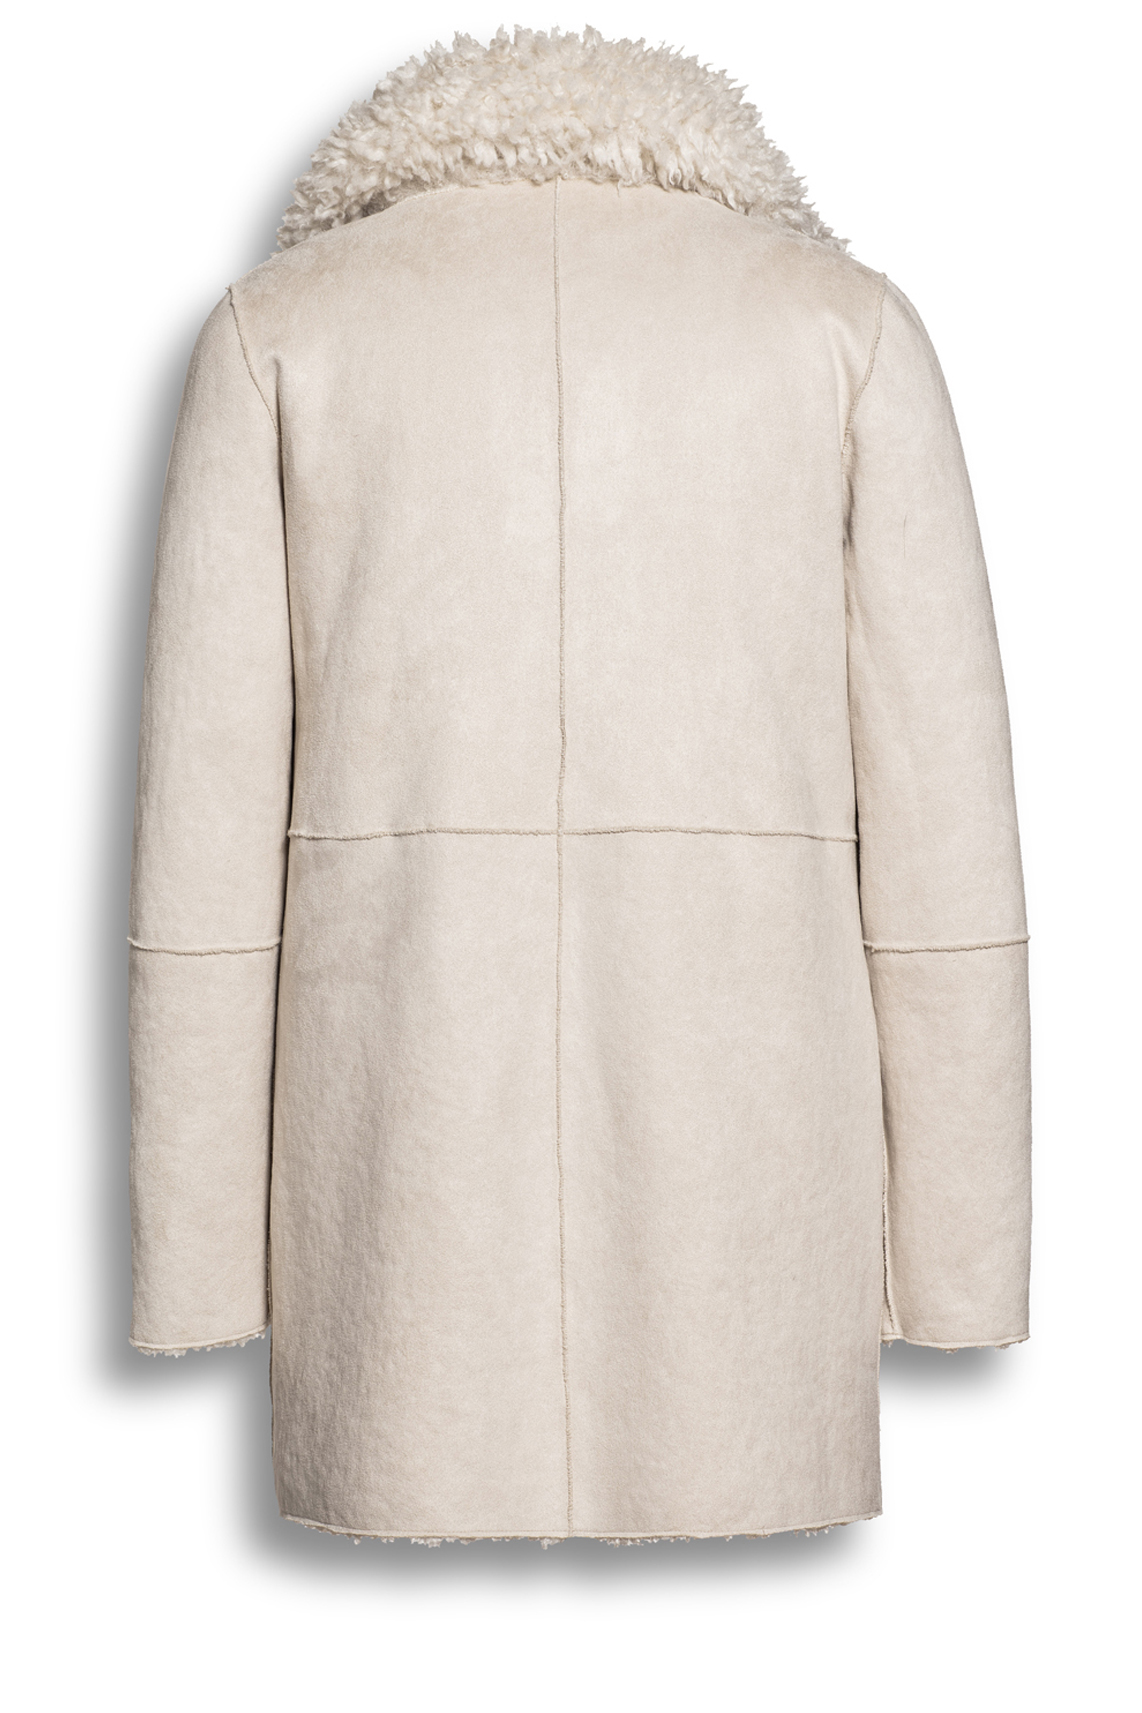 Beaumont Dames Reversibele lammy jas wit